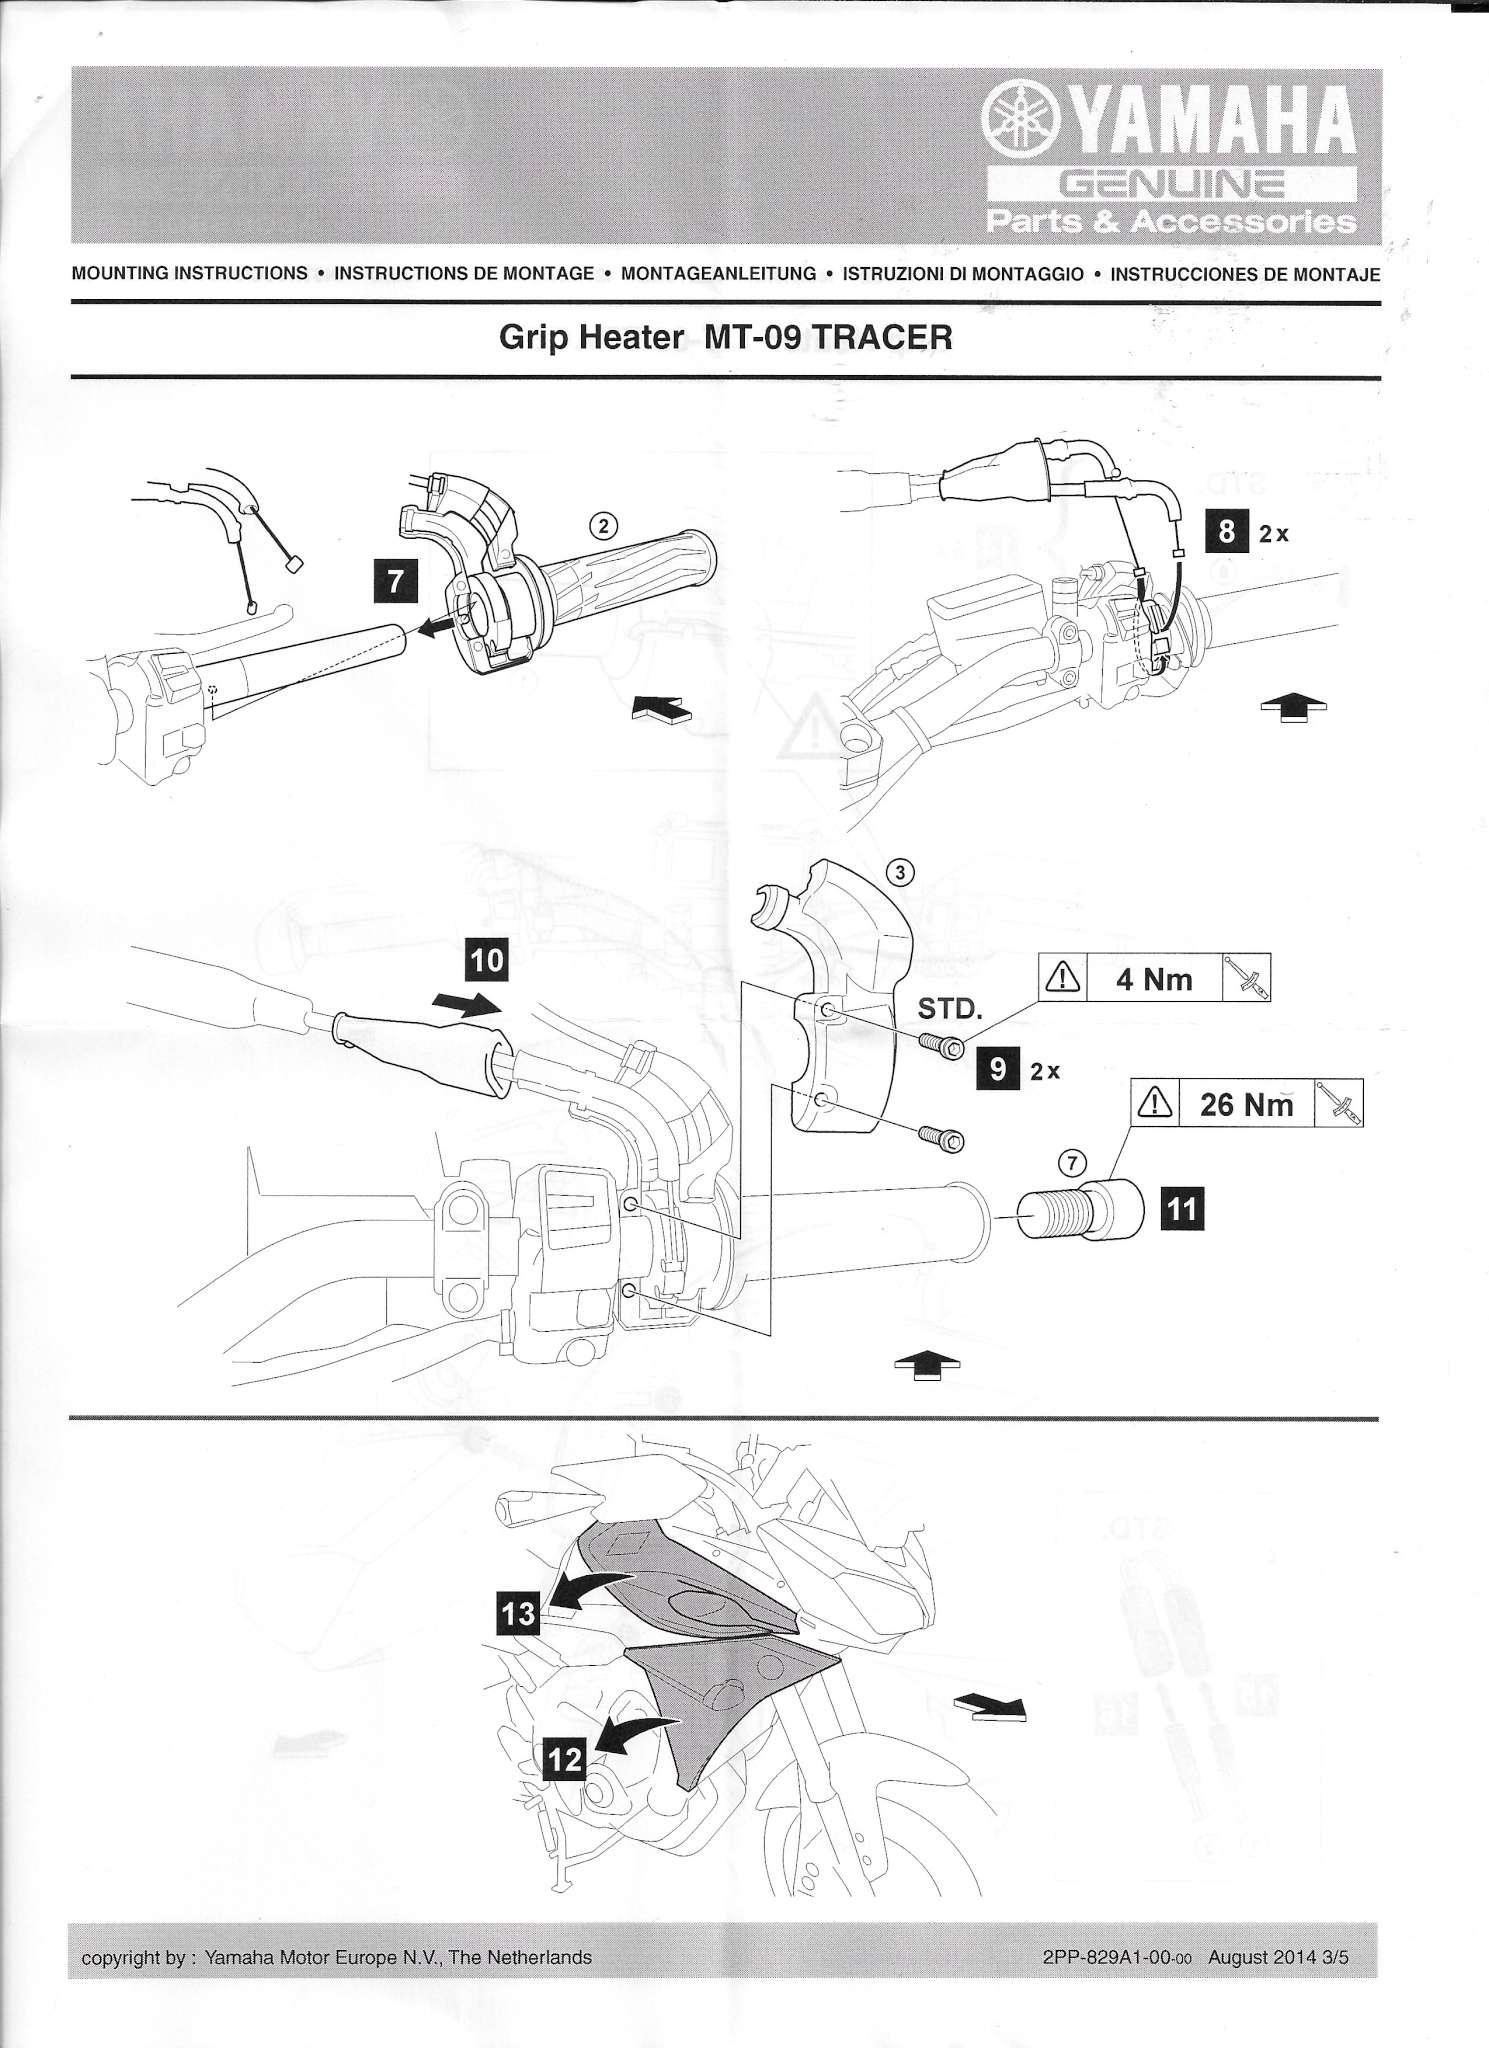 Poignées chauffantes Yamaha Tracer - Page 3 Yamaha12